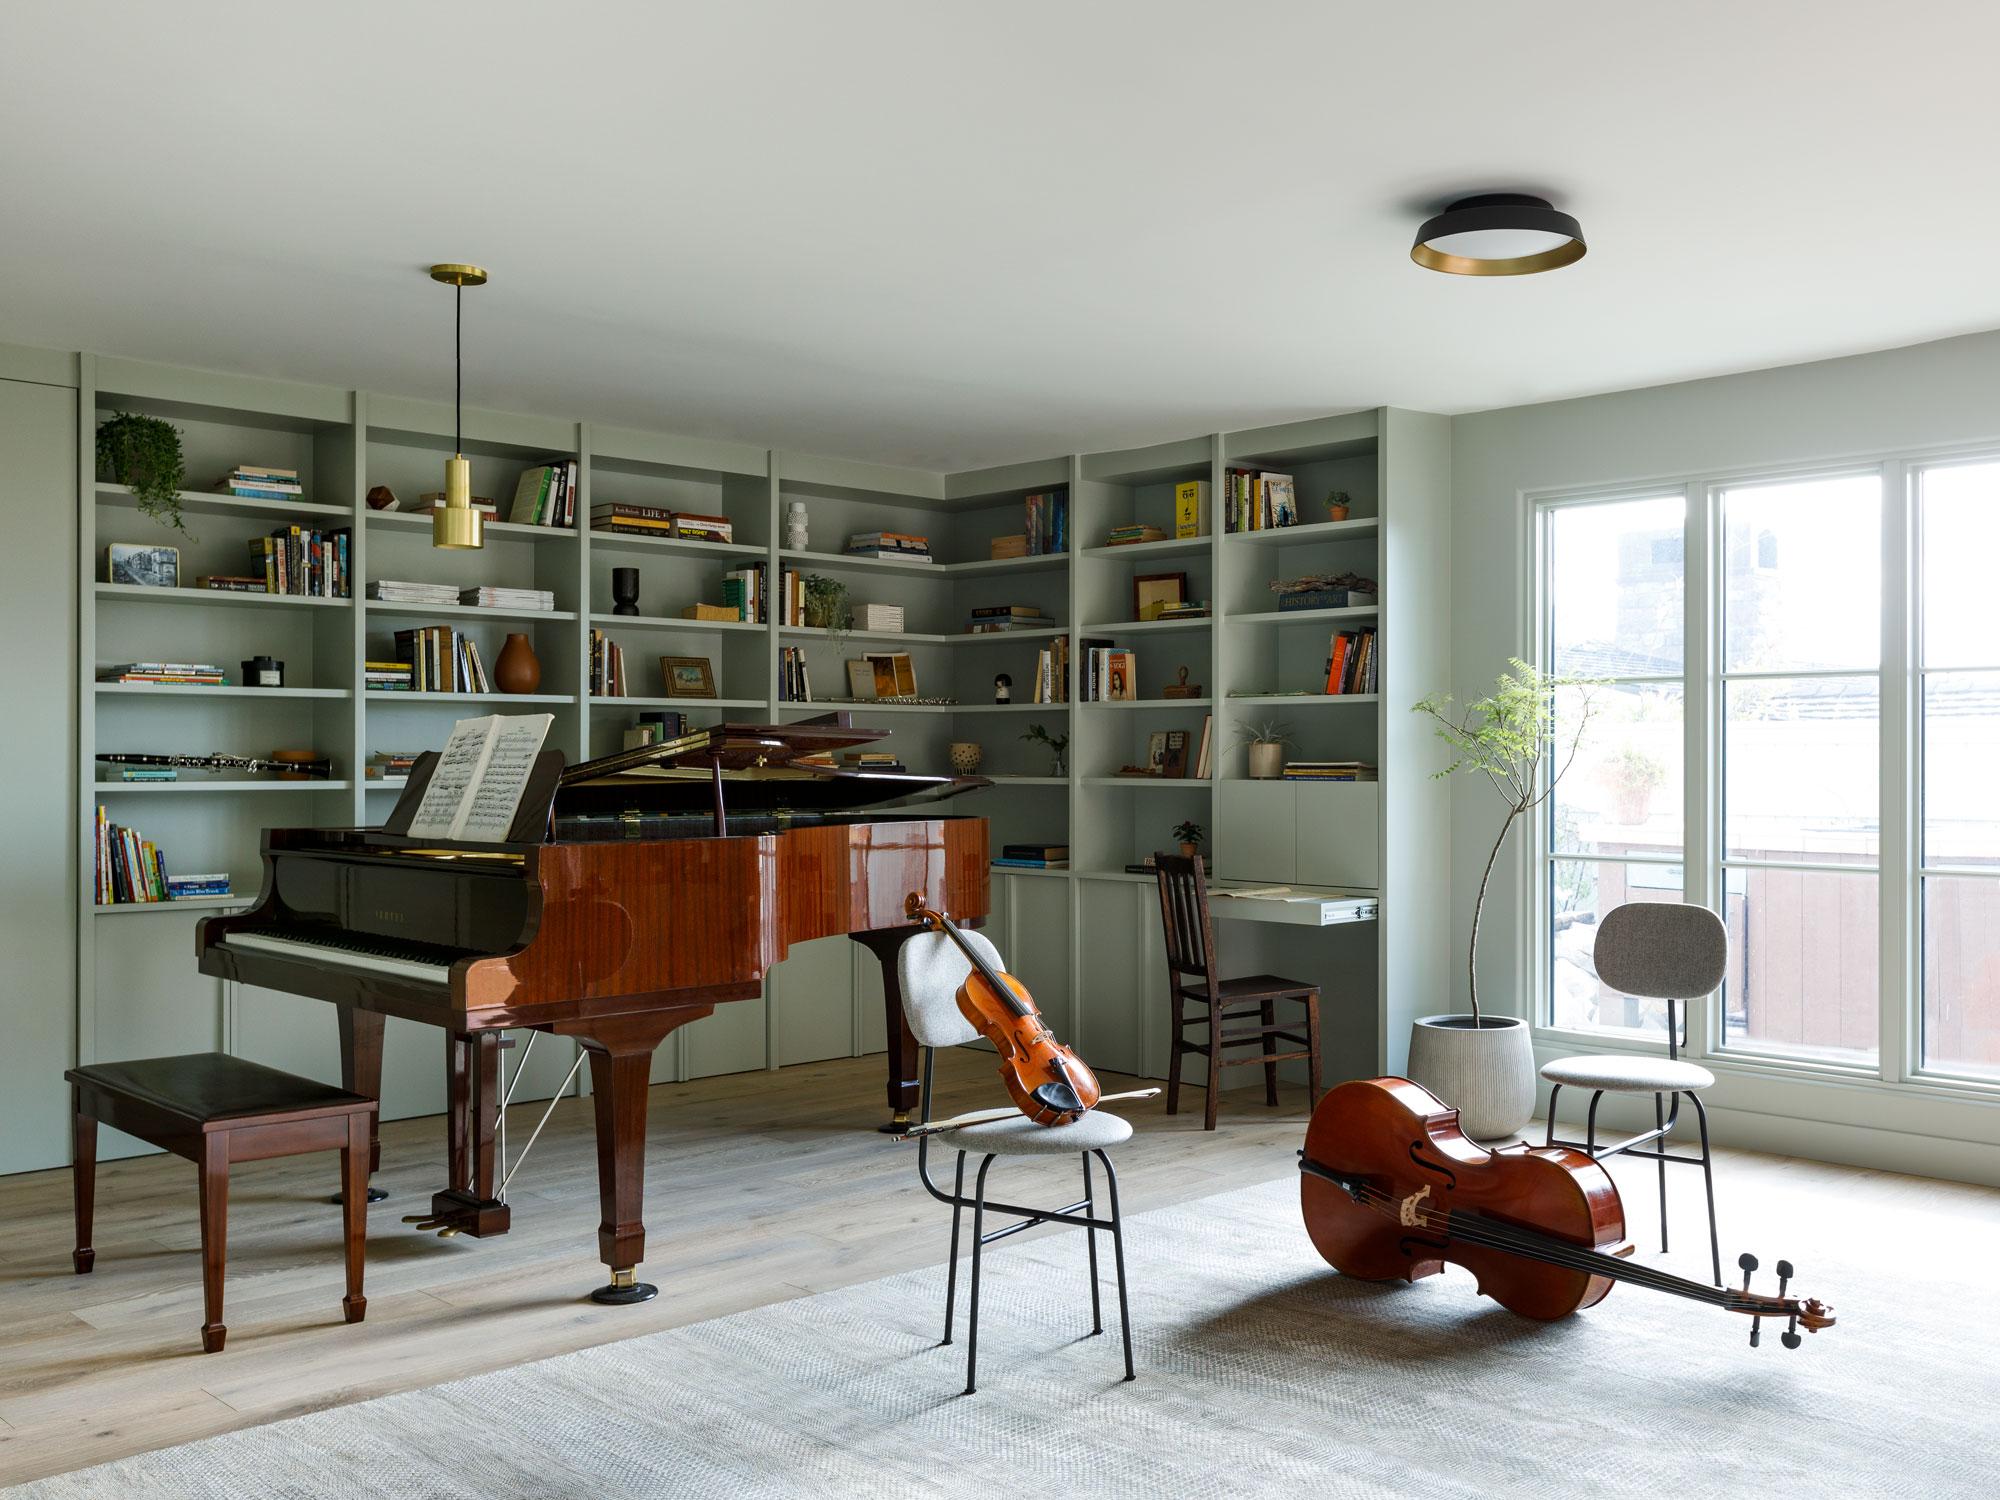 La Fortuna Residence La Home Beatriz Rose Byrdesign Photo Laure Joliet Yellowtrace 16